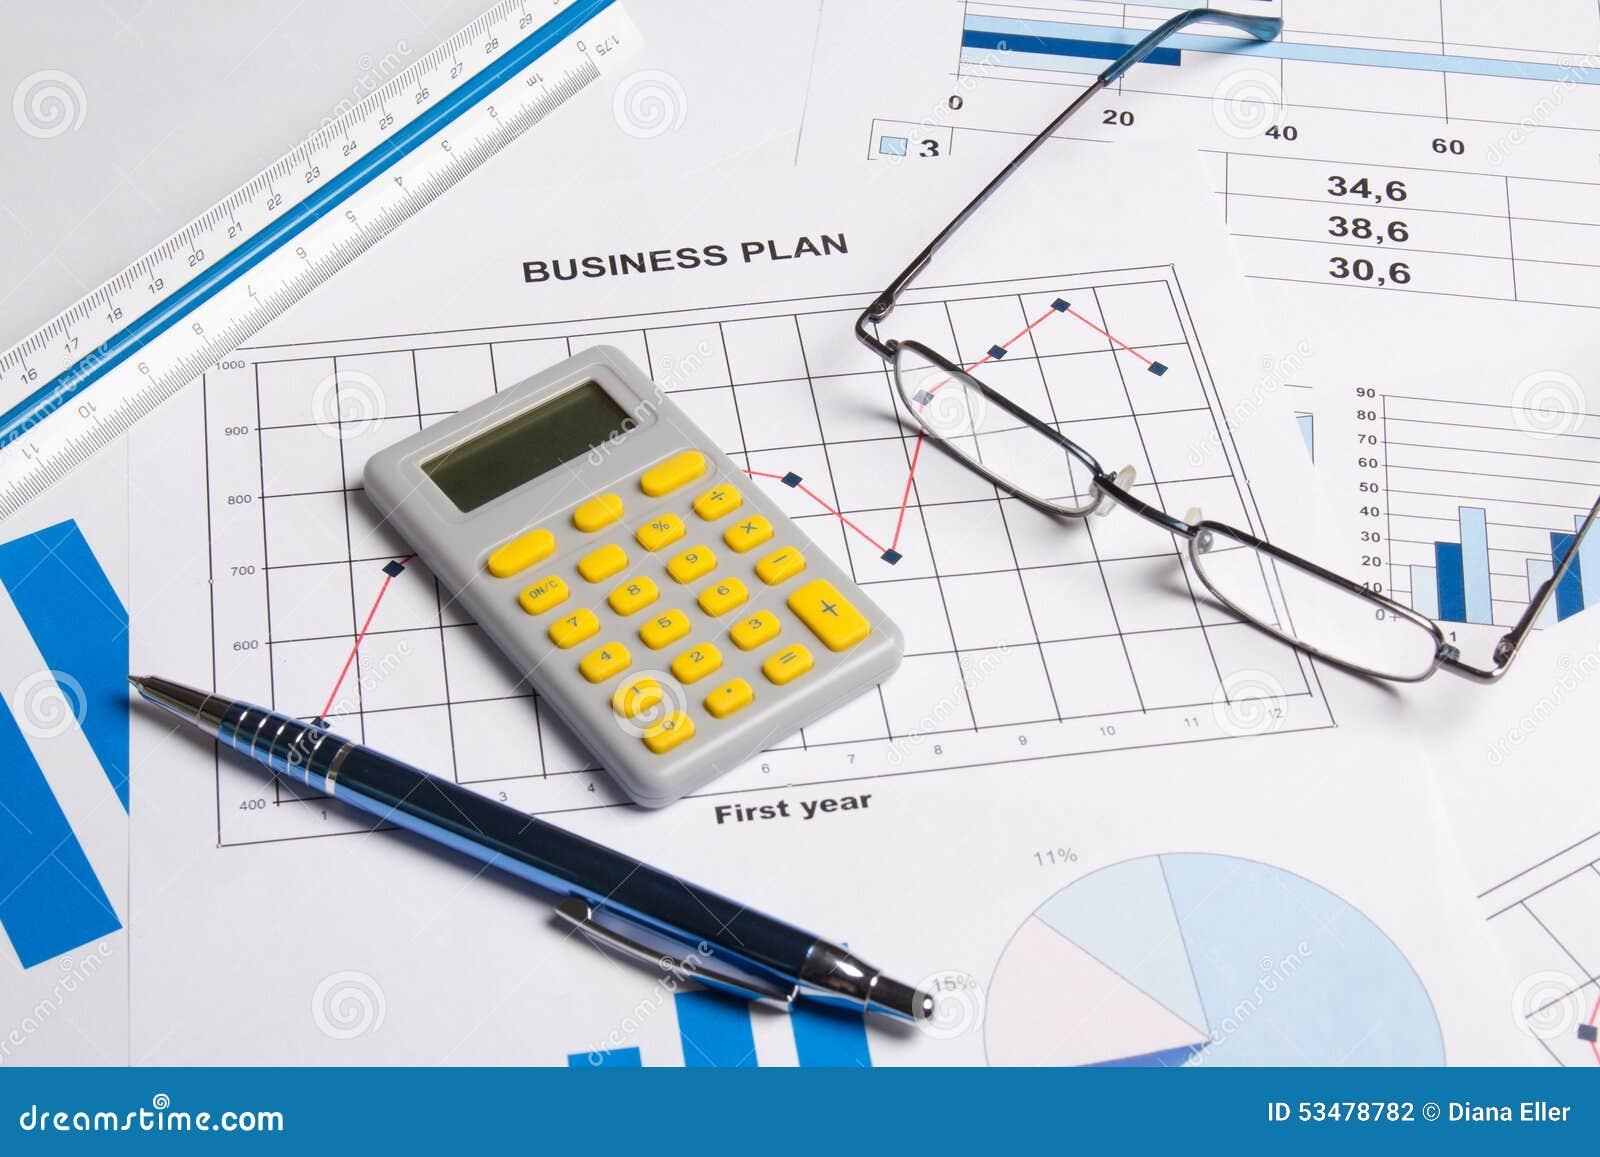 Equipment Finance Repayment Calculator